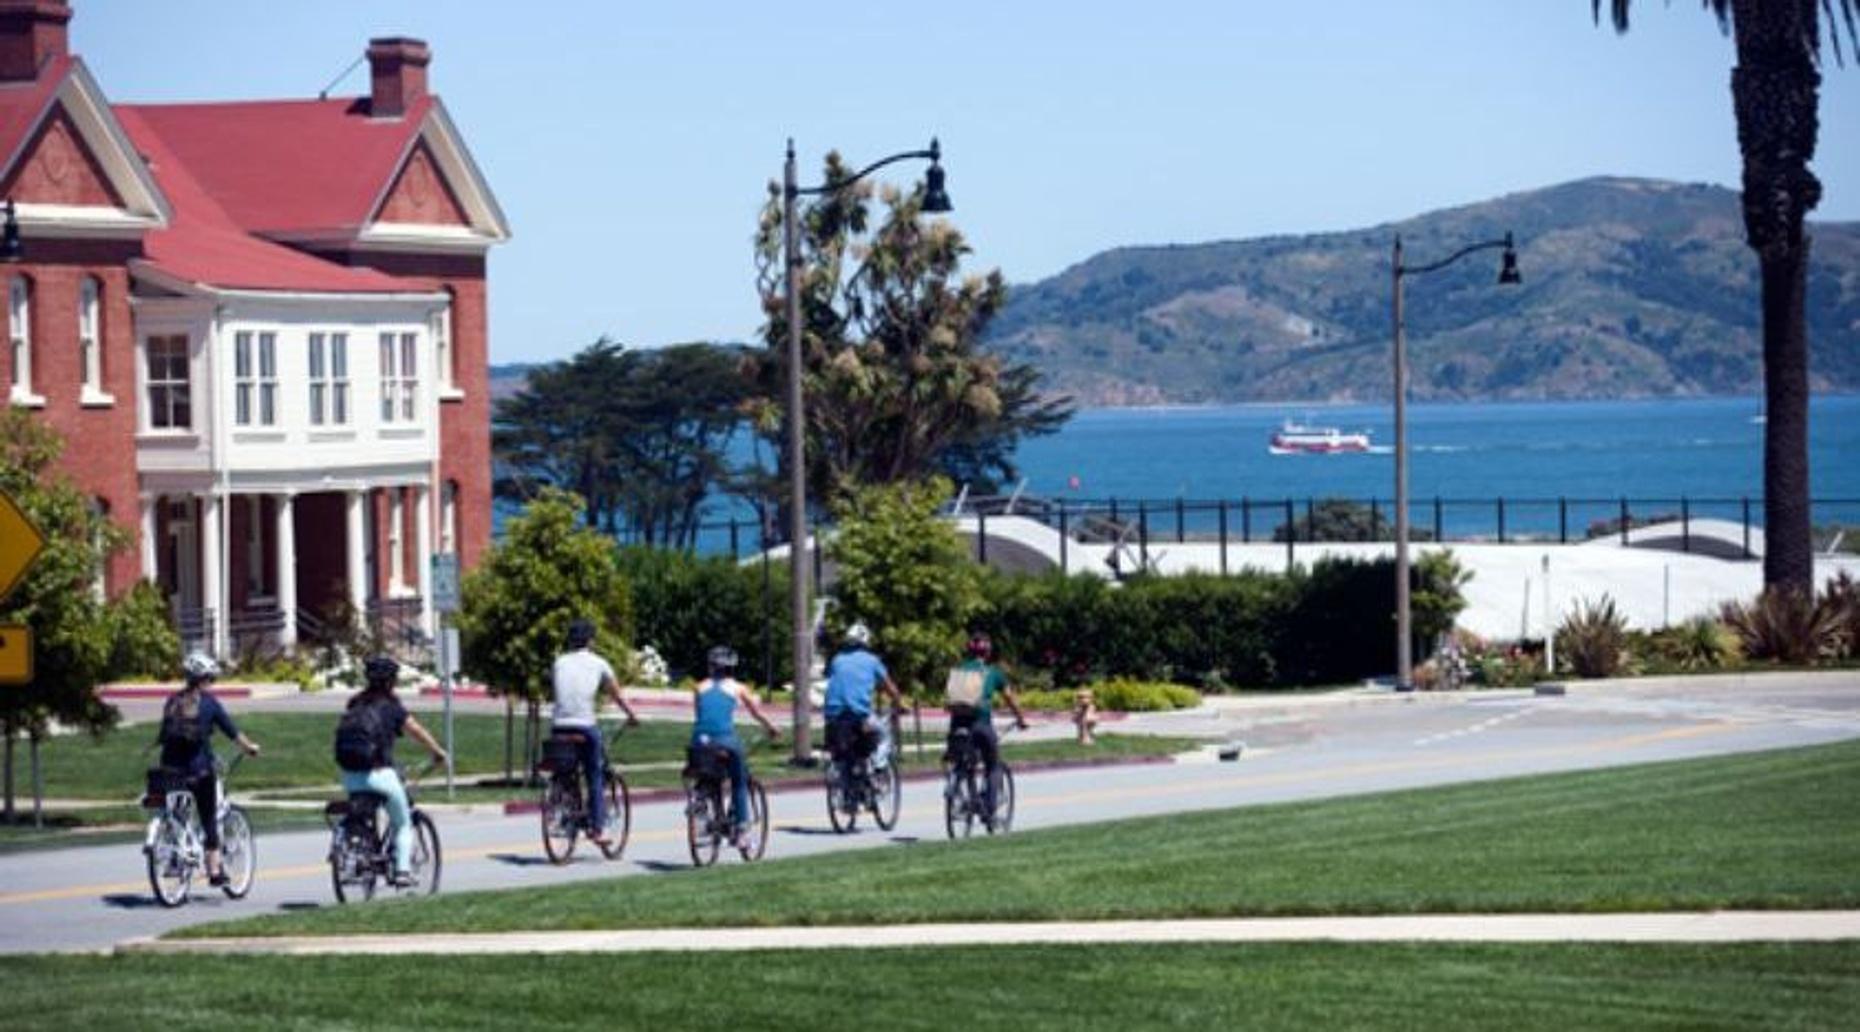 The Golden Gate & Sausalito Bike Tour